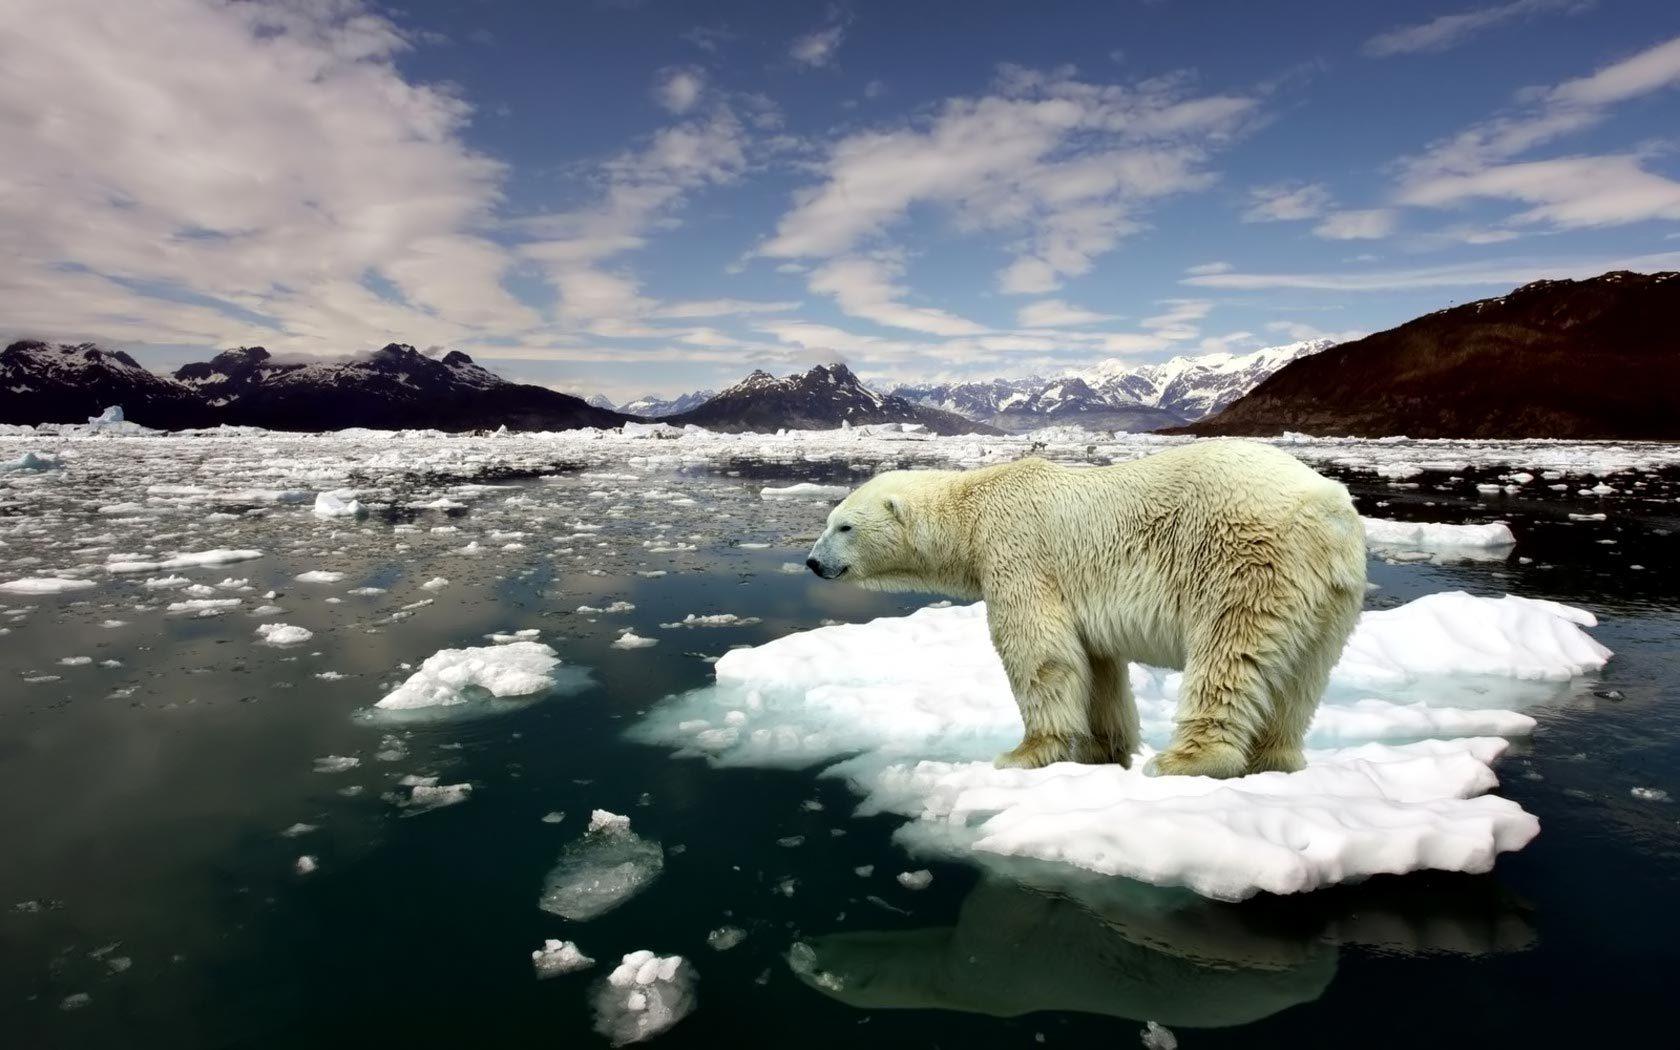 1680x1050-jegesmedve-172.jpg